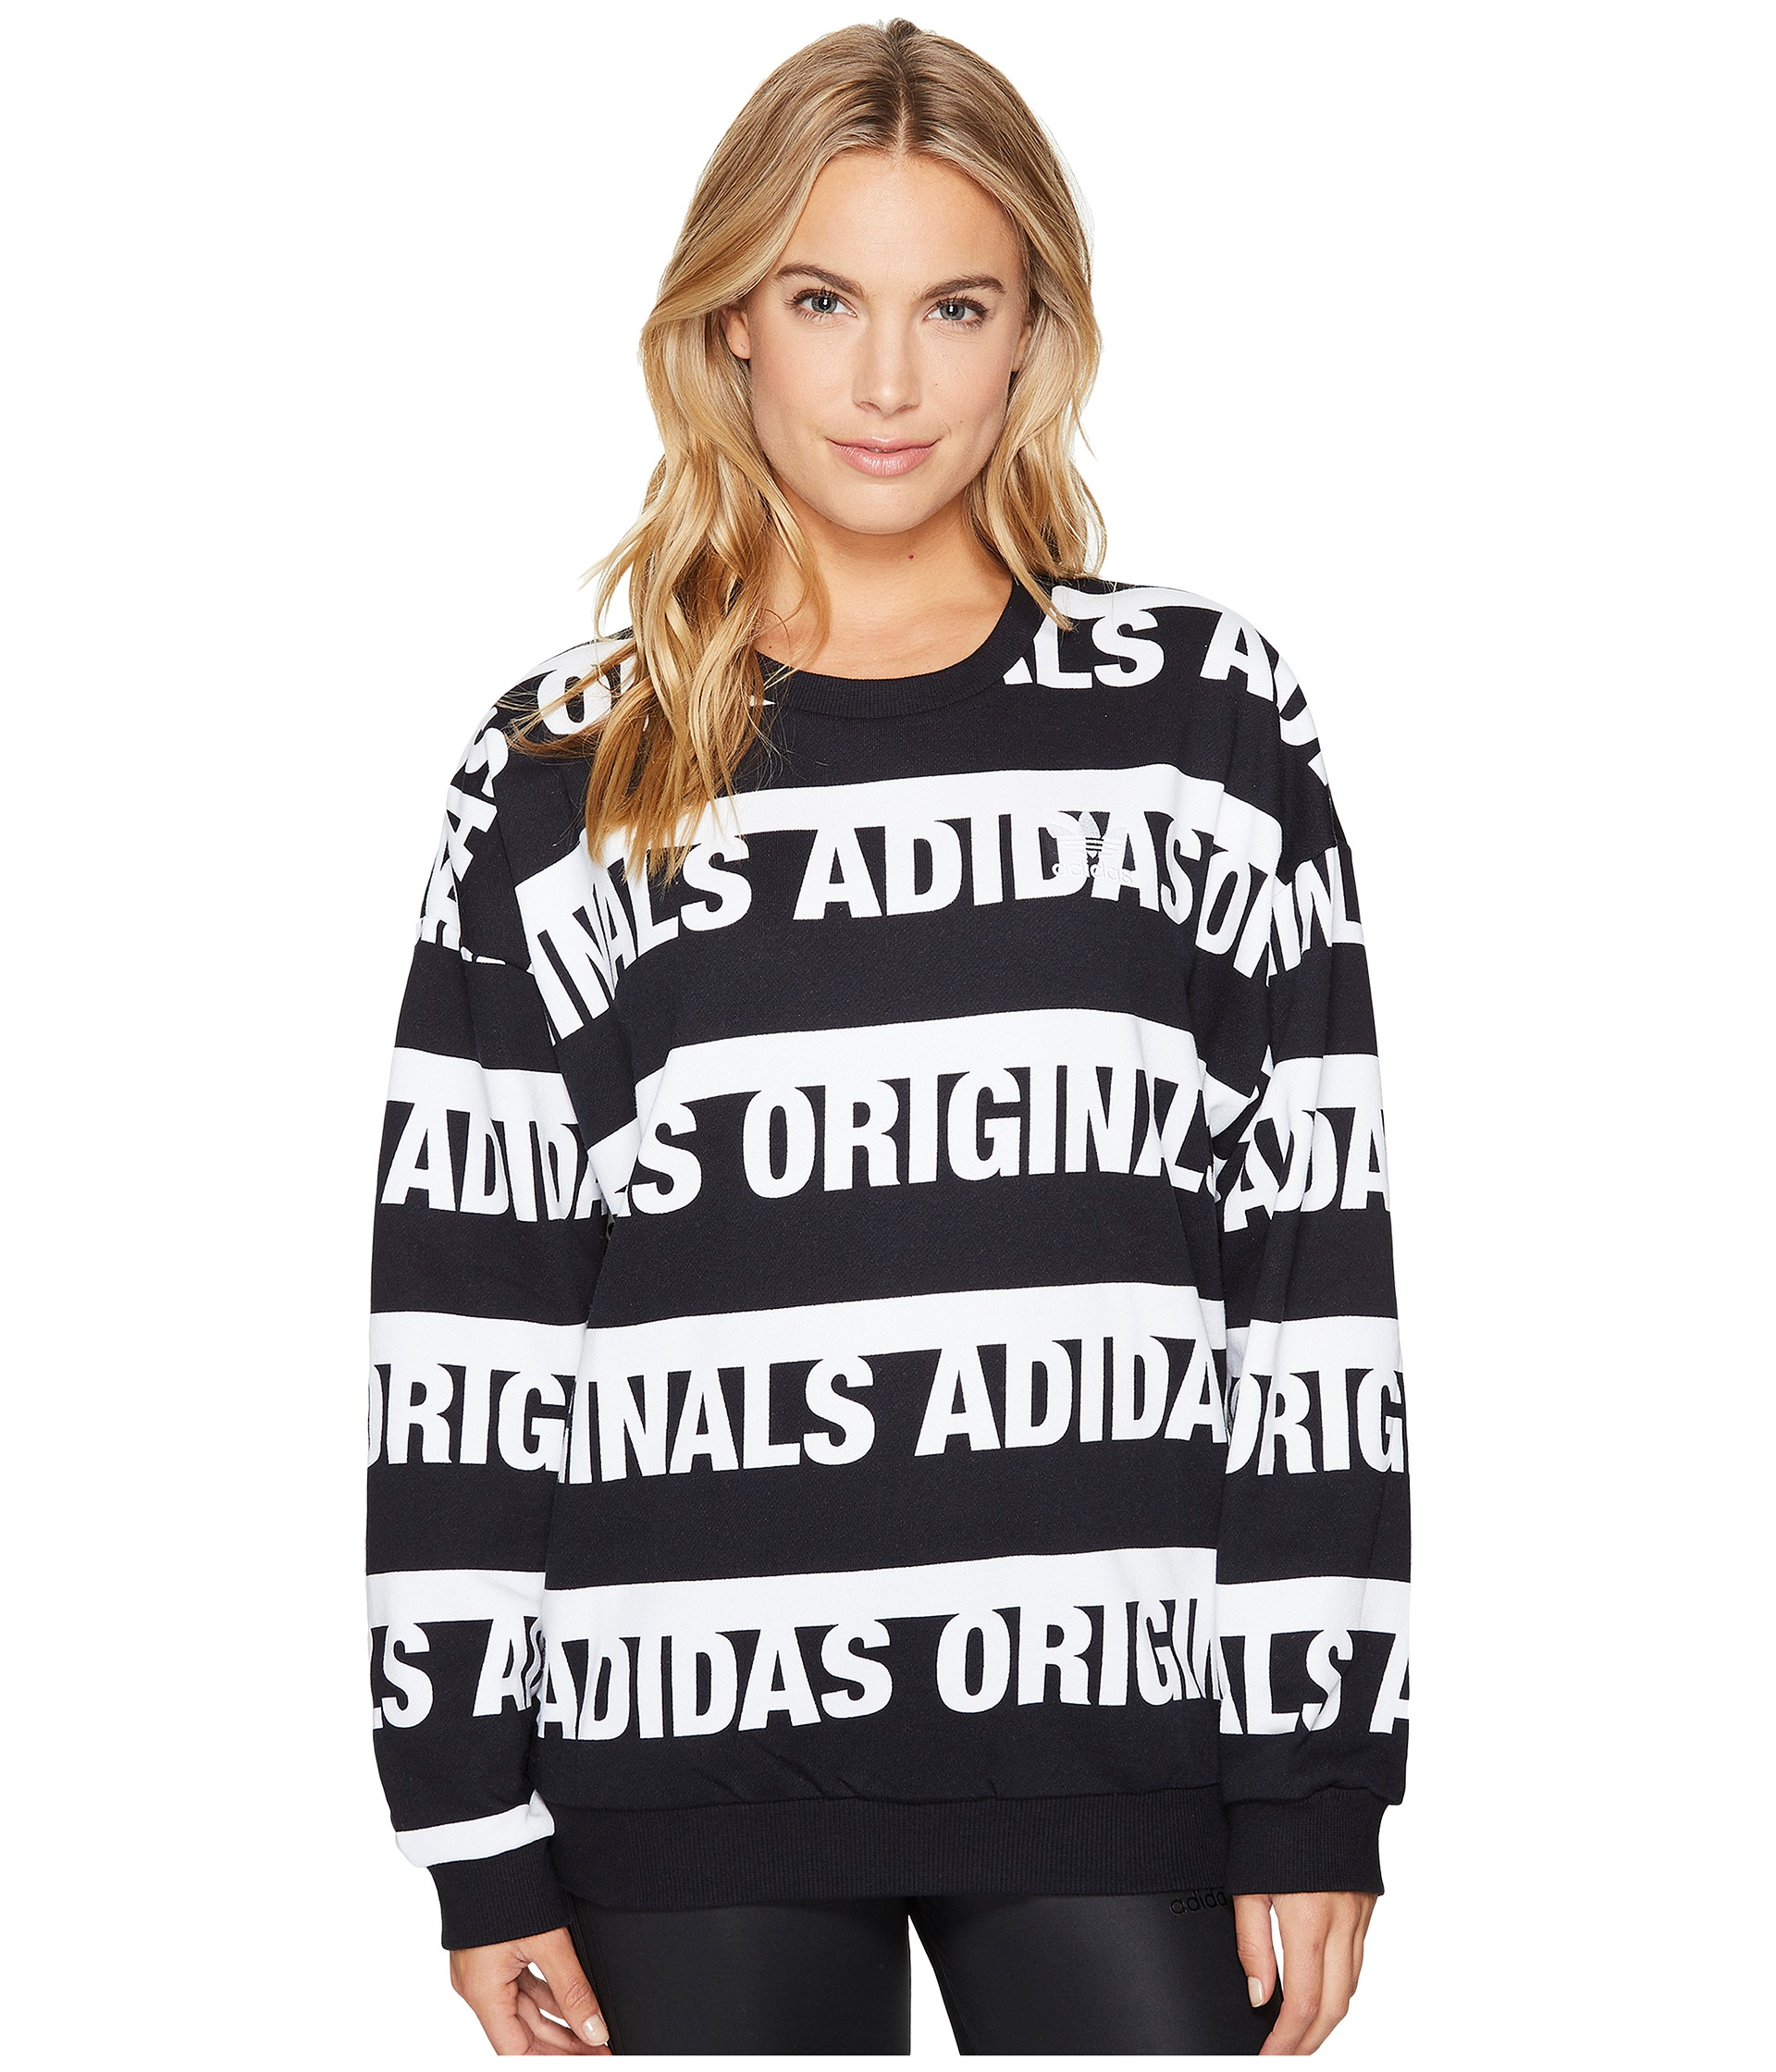 aa7d1a1a46 adidas trefoil hoodie